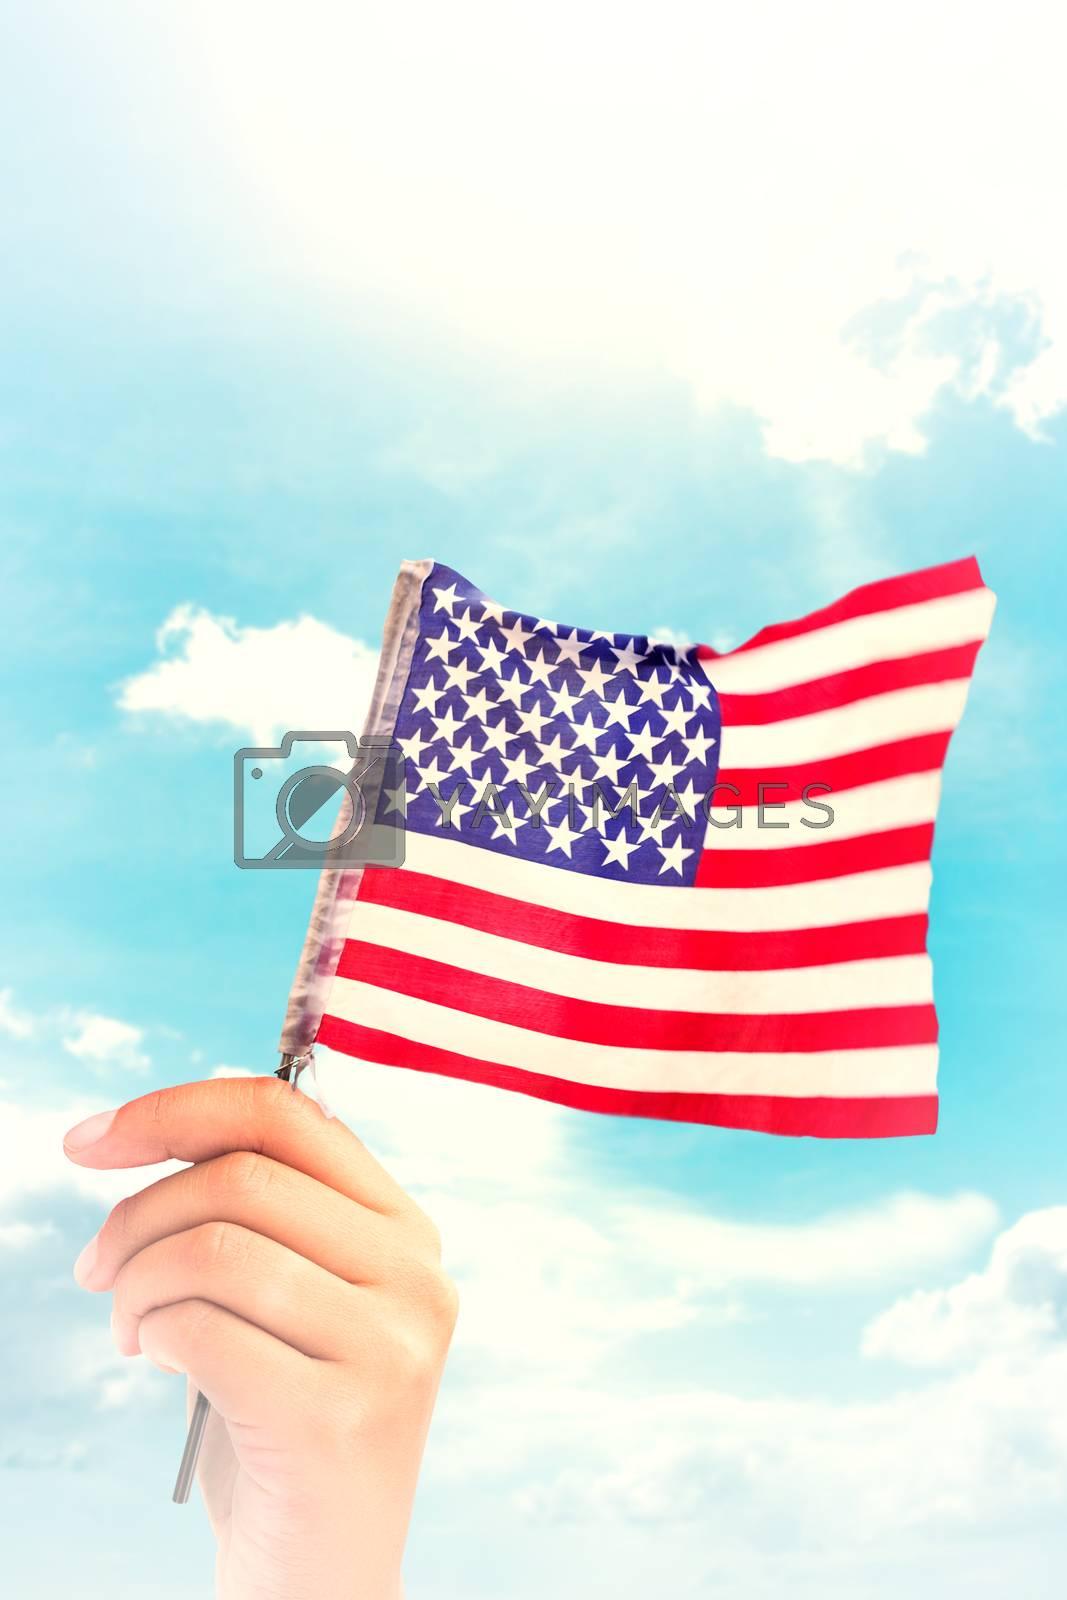 Hand waving american flag against blue sky